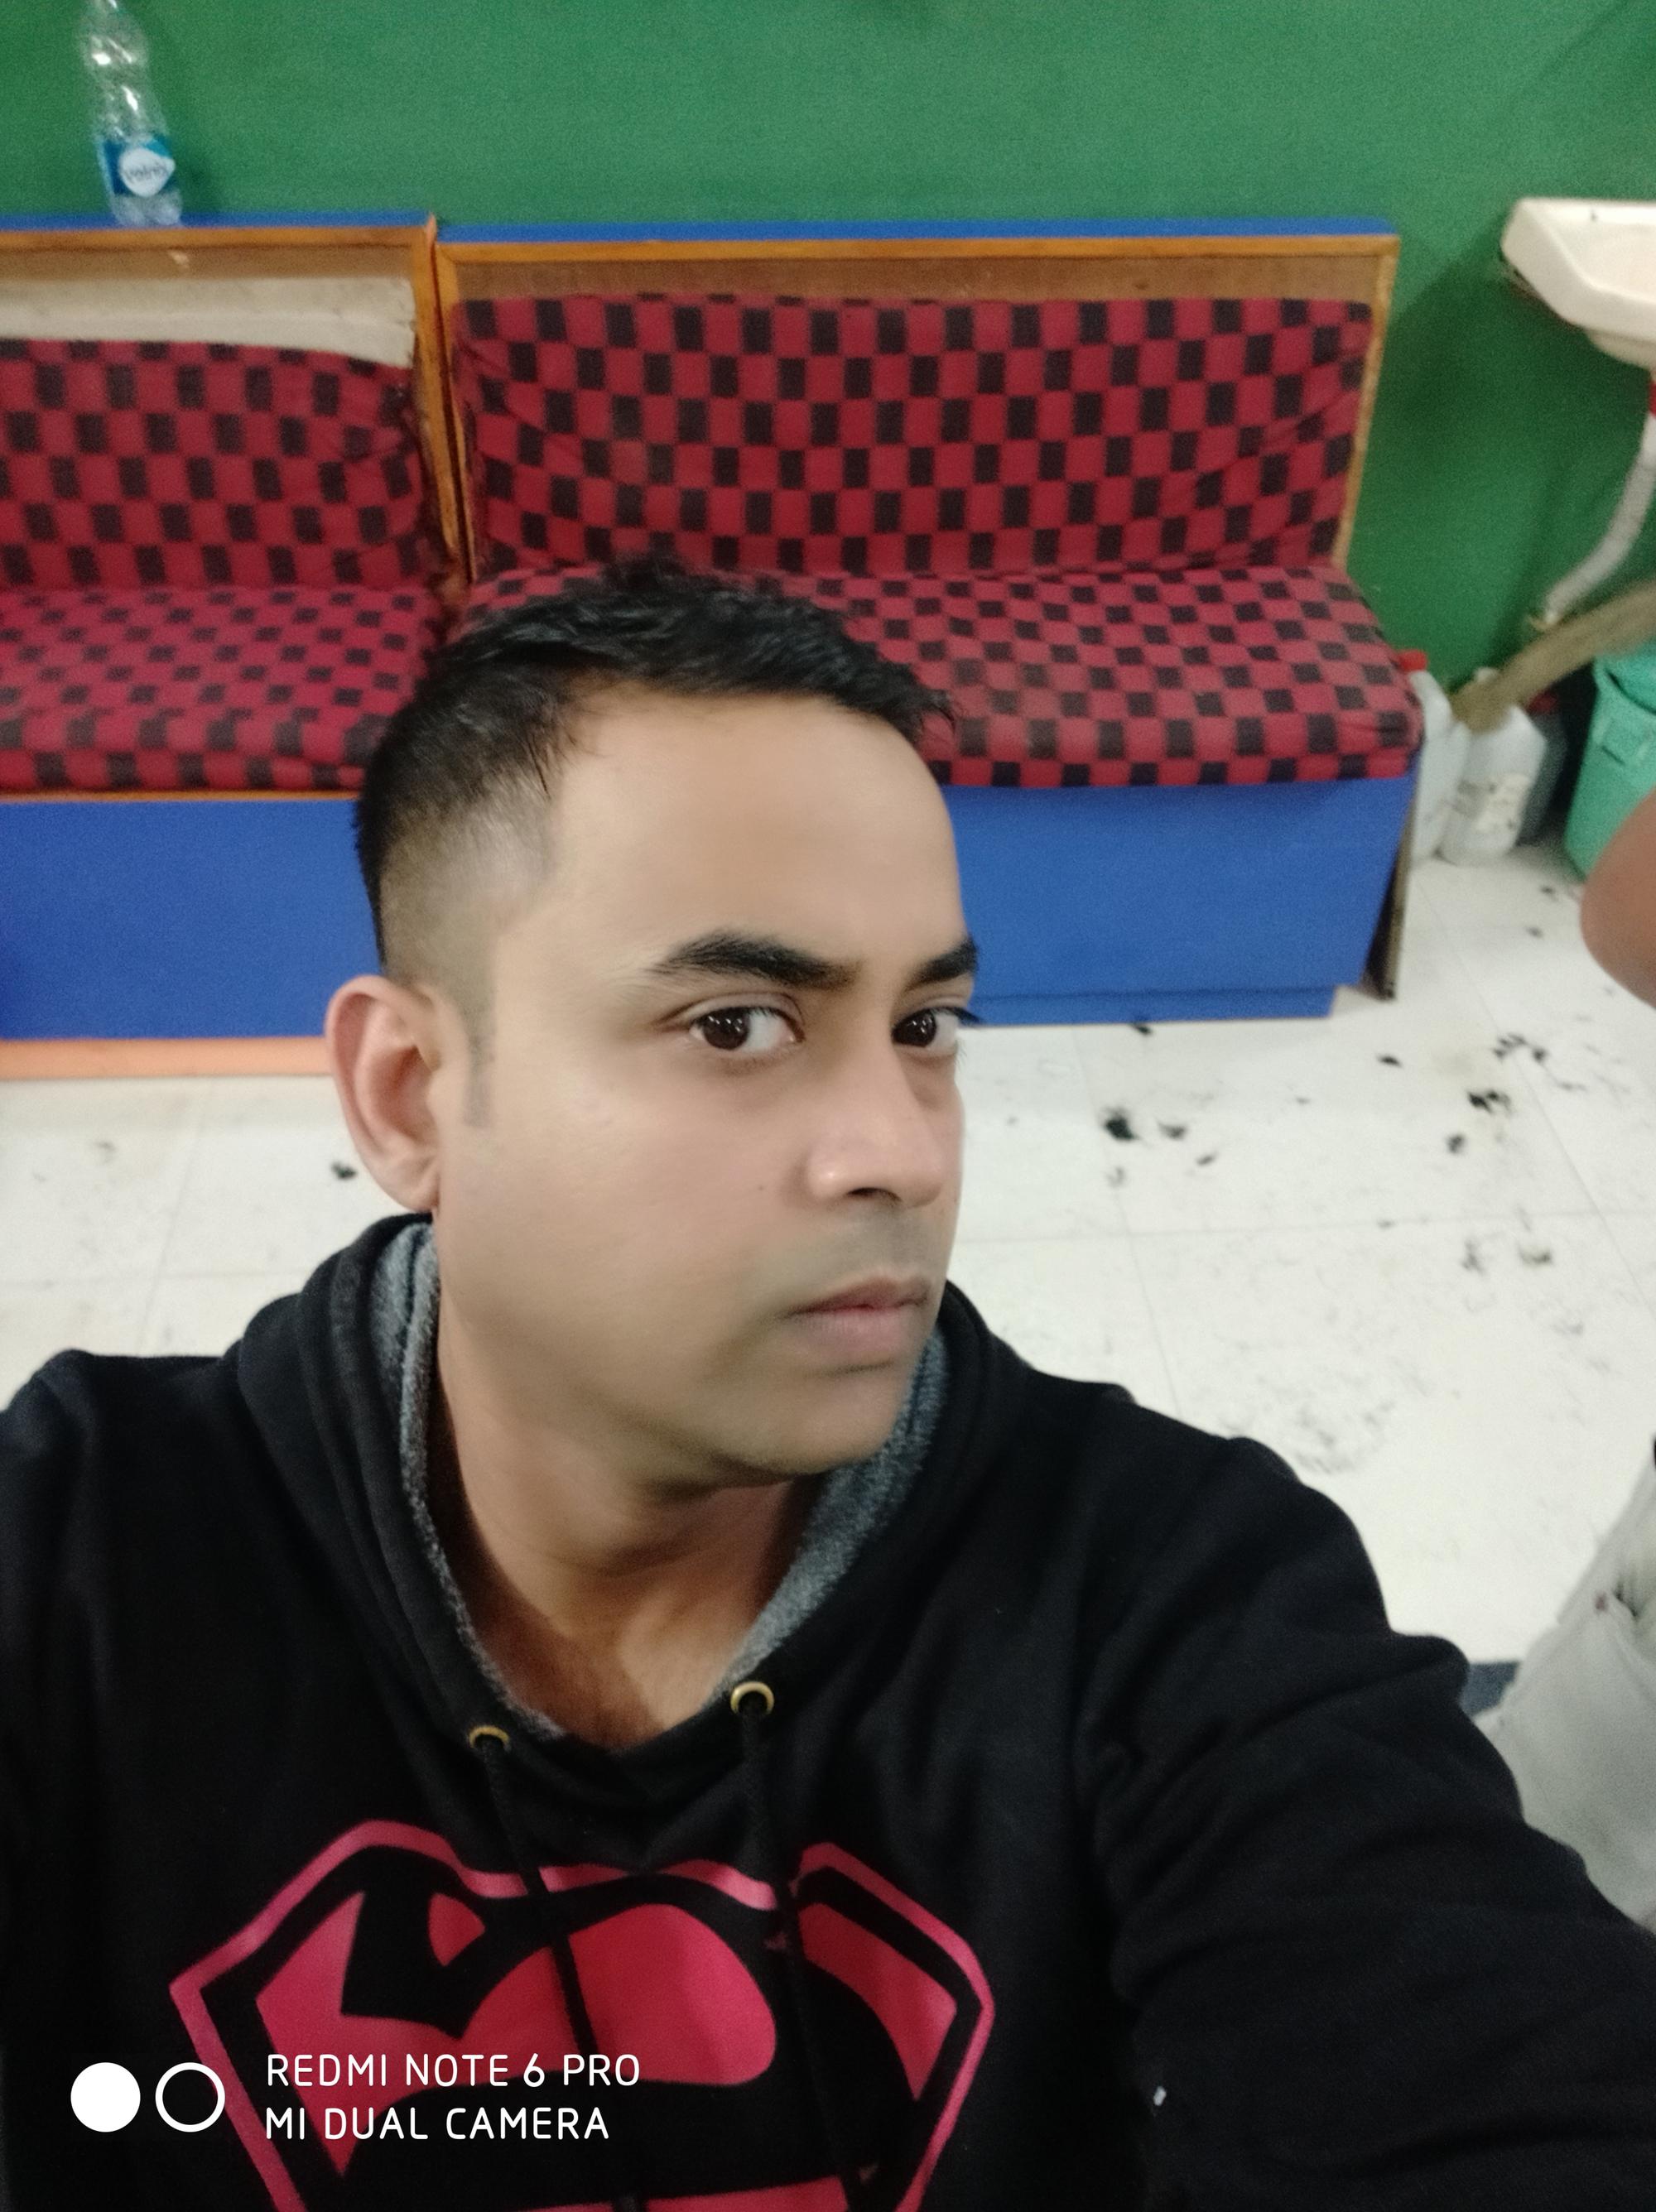 Dr. Mohammed Mudassir Ahmed